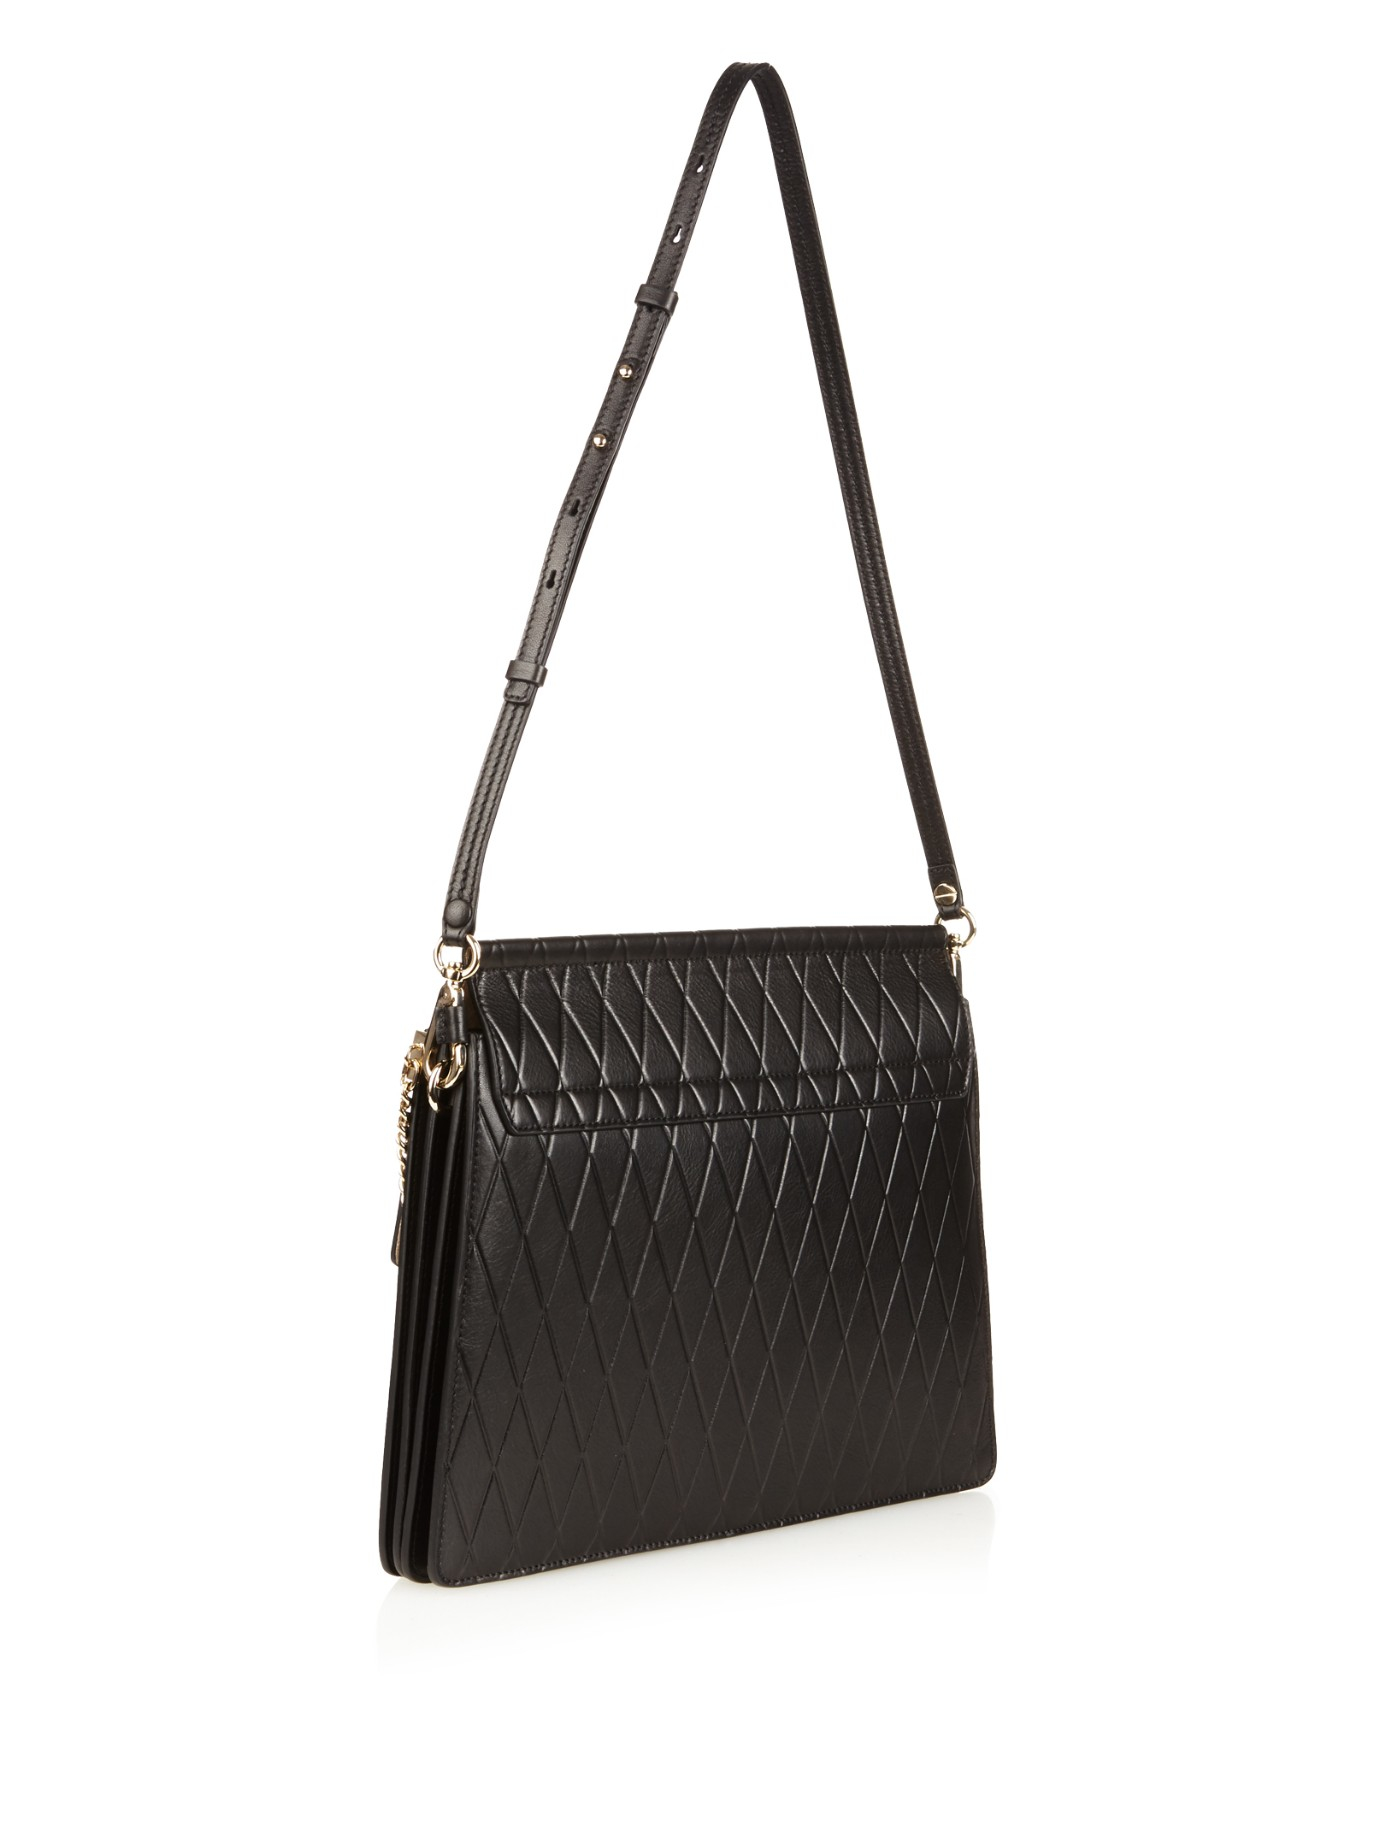 replica handbags chloe - faye small bag in diamond embossed smooth calfskin